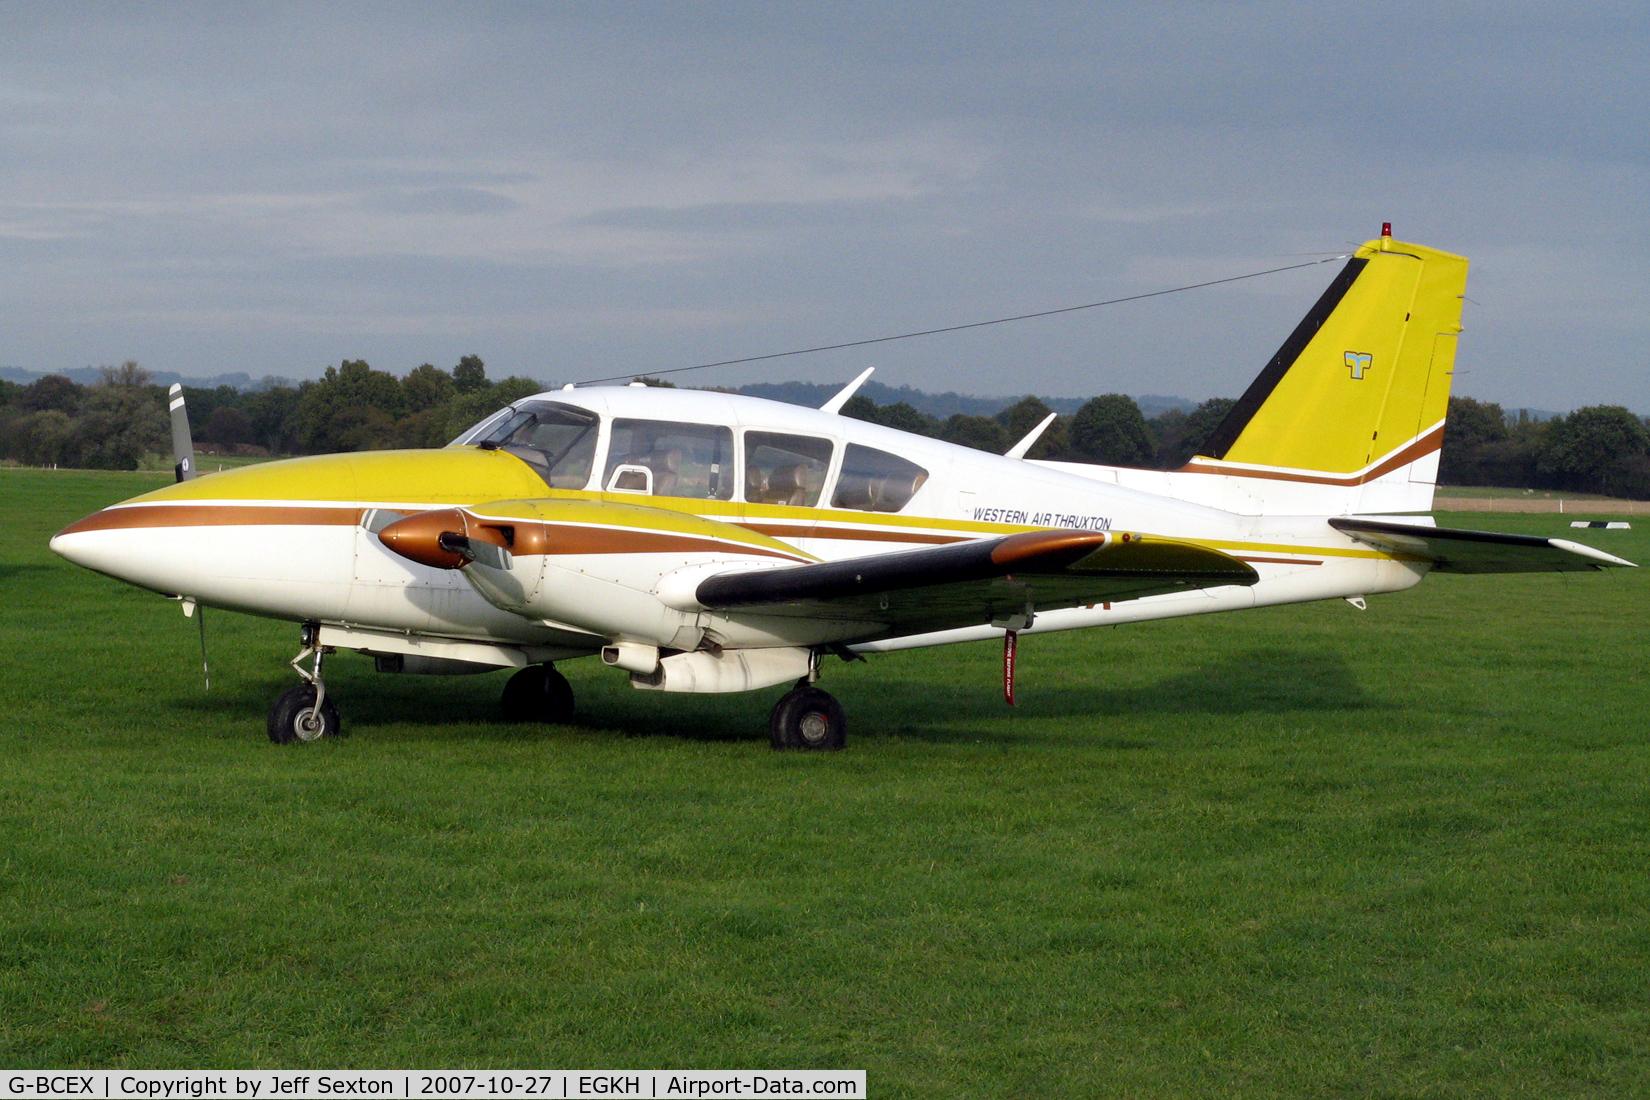 G-BCEX, 1973 Piper PA-E23-250 Aztec C/N 27-7305024, Headcorn Flight-line